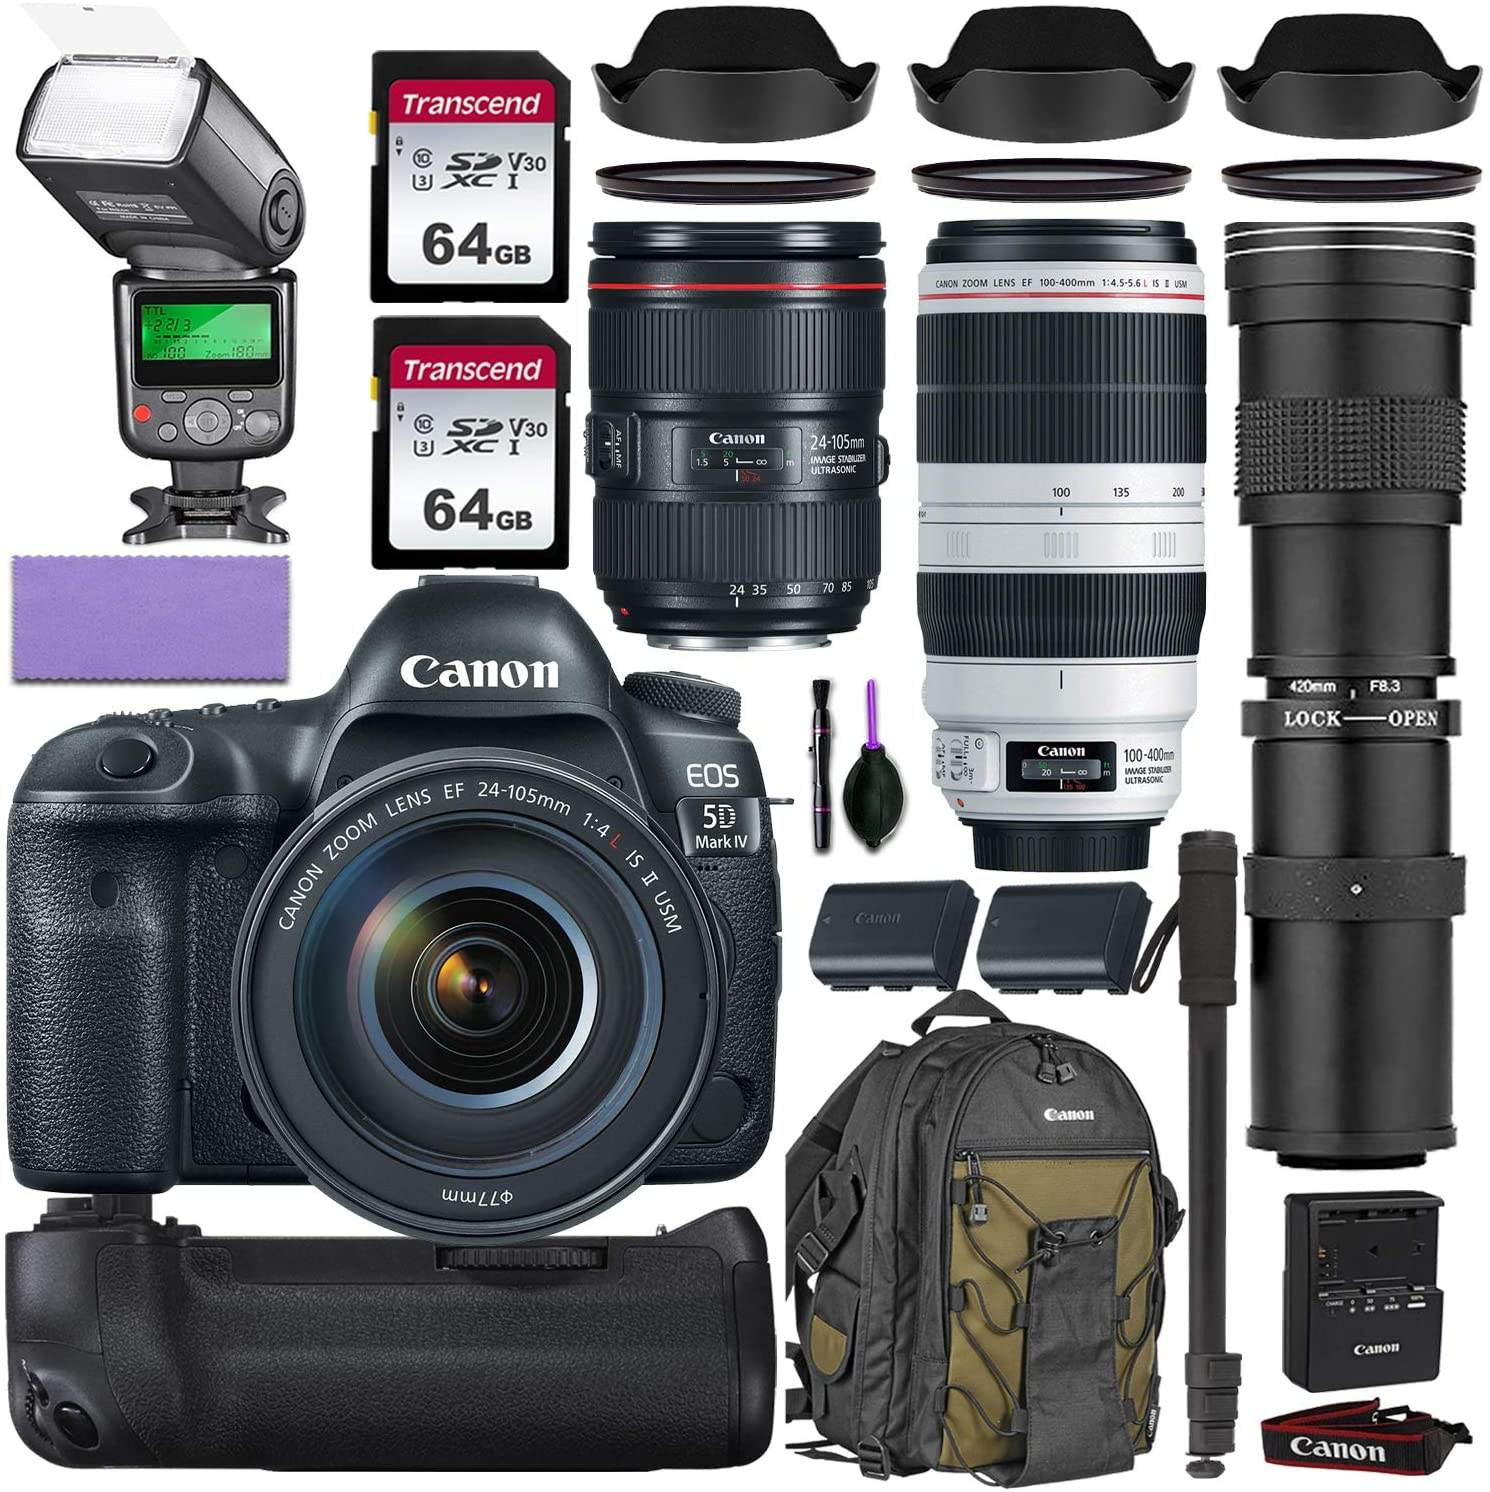 Canon EOS 5D Mark IV DSLR Macchina Fotografica Digitale e 24-105mm f 4L II USM Lens + 64GB Pro Video Kit Fotocamera Digitale